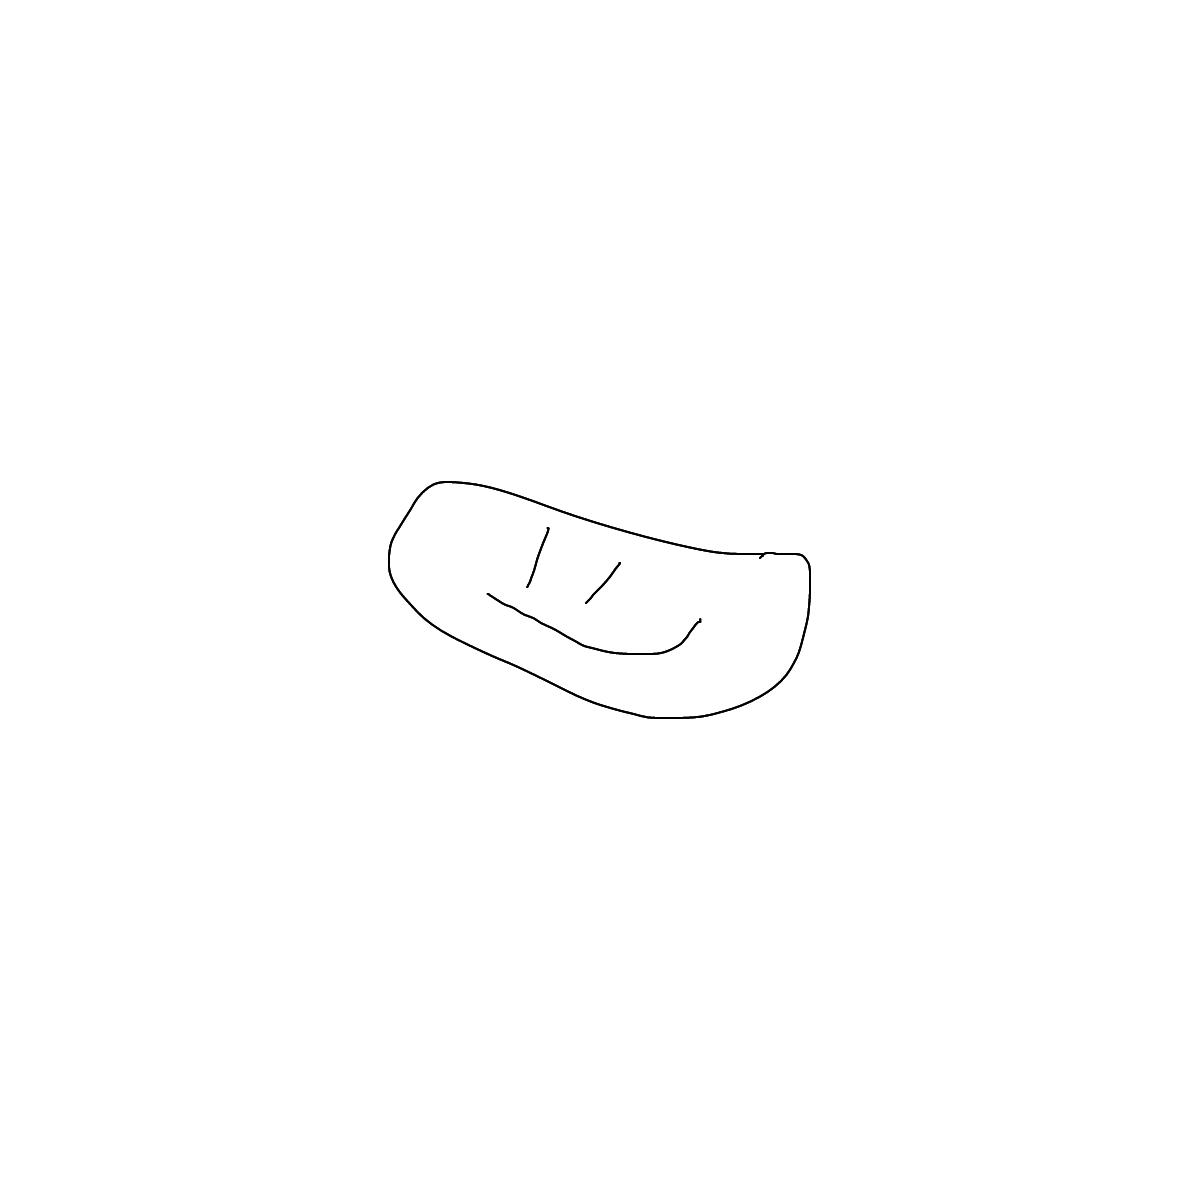 BAAAM drawing#436 lat:54.1511192321777340lng: -7.4892511367797850